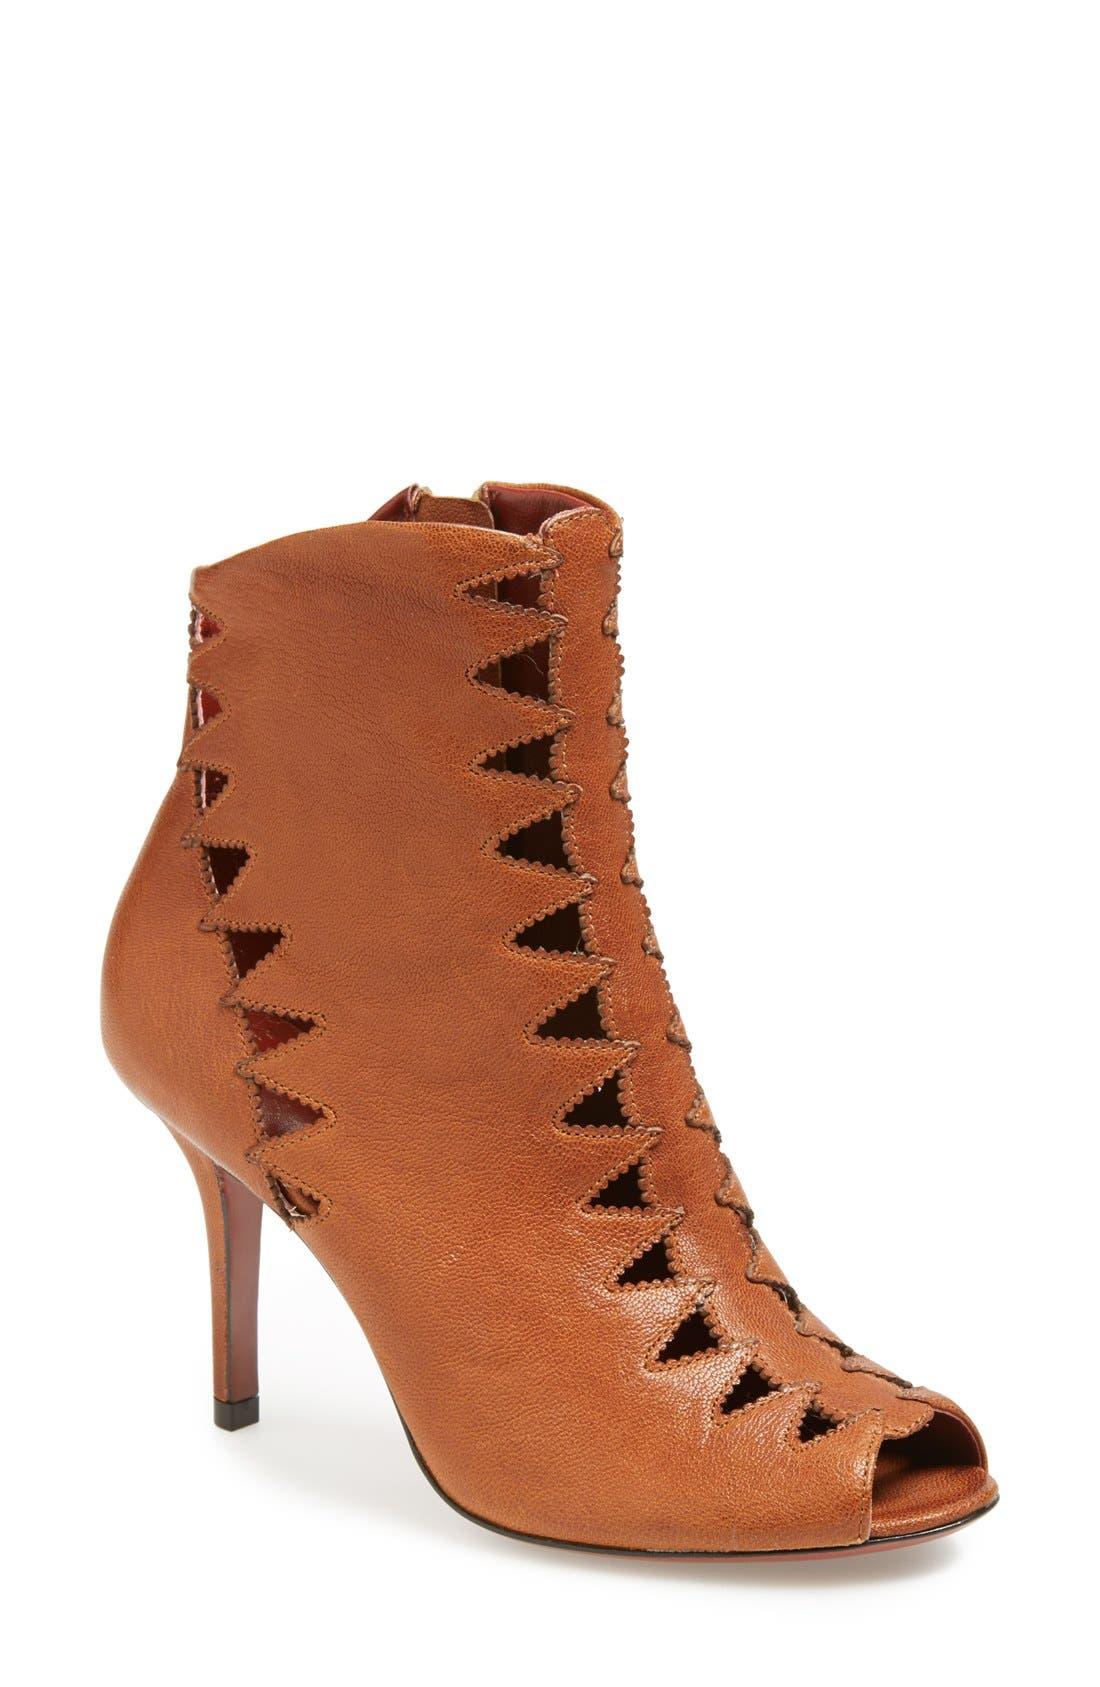 Alternate Image 1 Selected - Aerin 'Carine' Peep Toe Leather Bootie (Women)